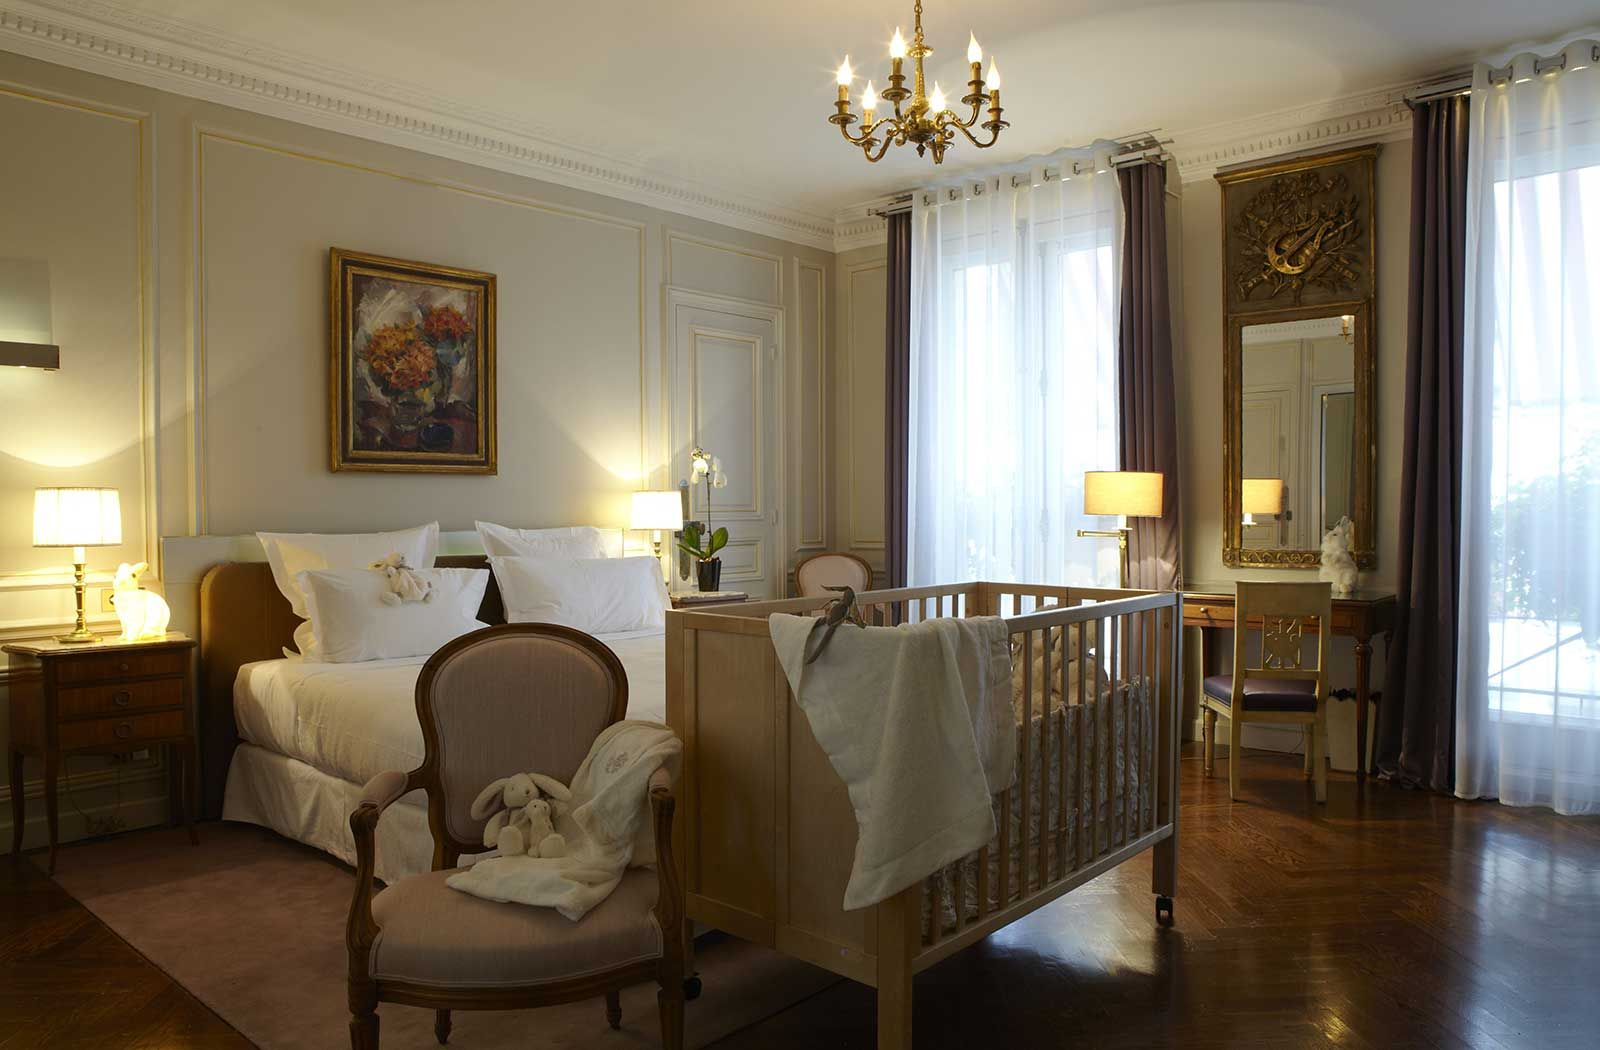 Photo Gallery Hotel Lancaster 5 Star Hotel Luxury Accommodation